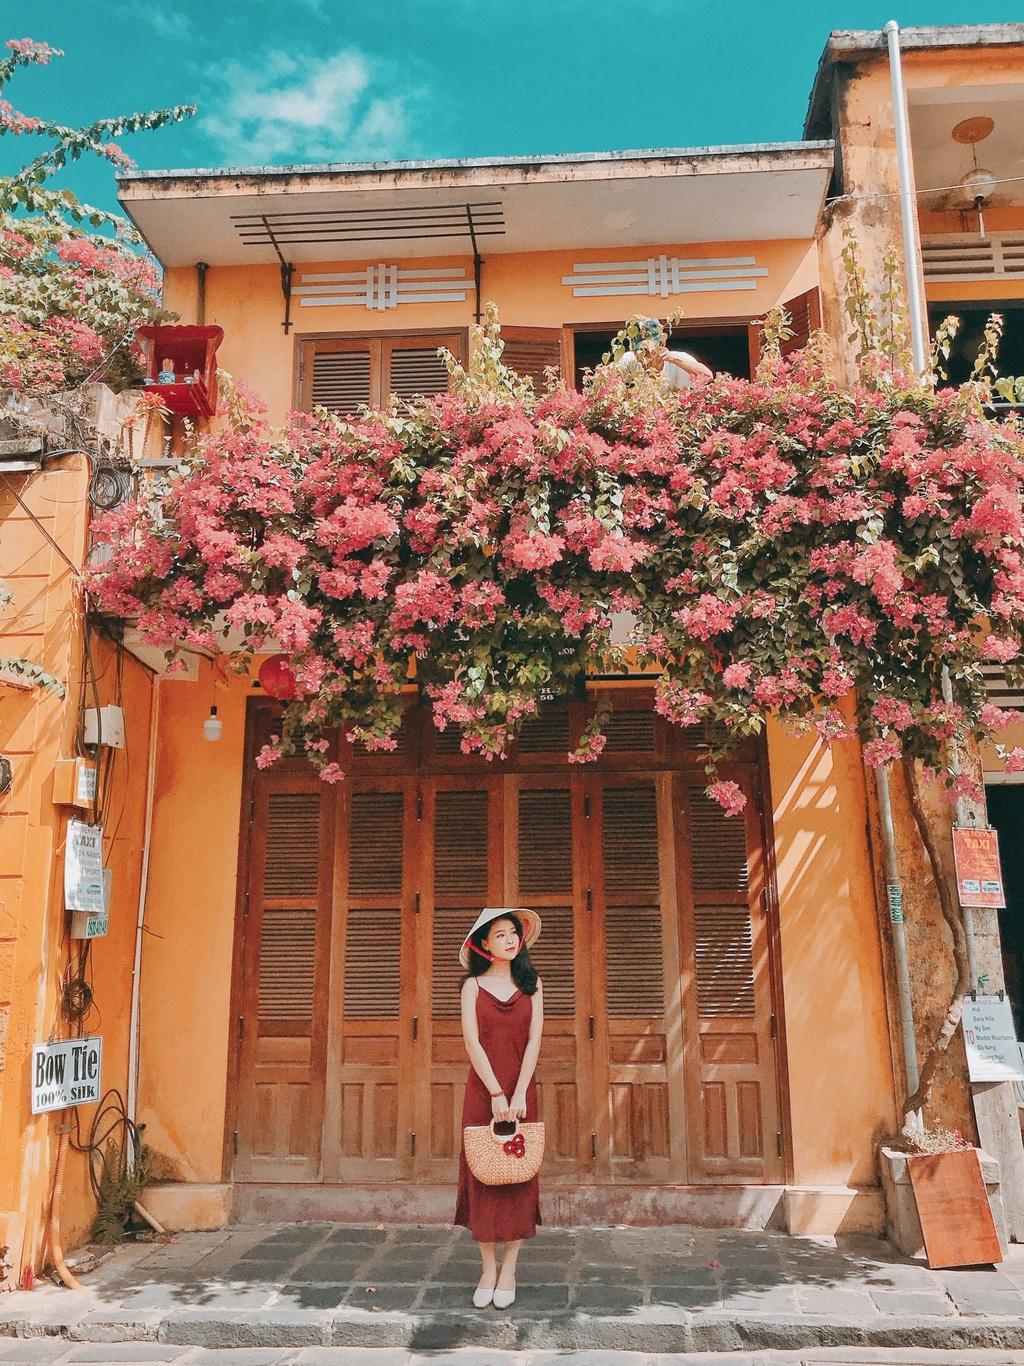 #Mytour: Da Nang - Hoi An lan dau gap go ma cu ngo than thuong hinh anh 11